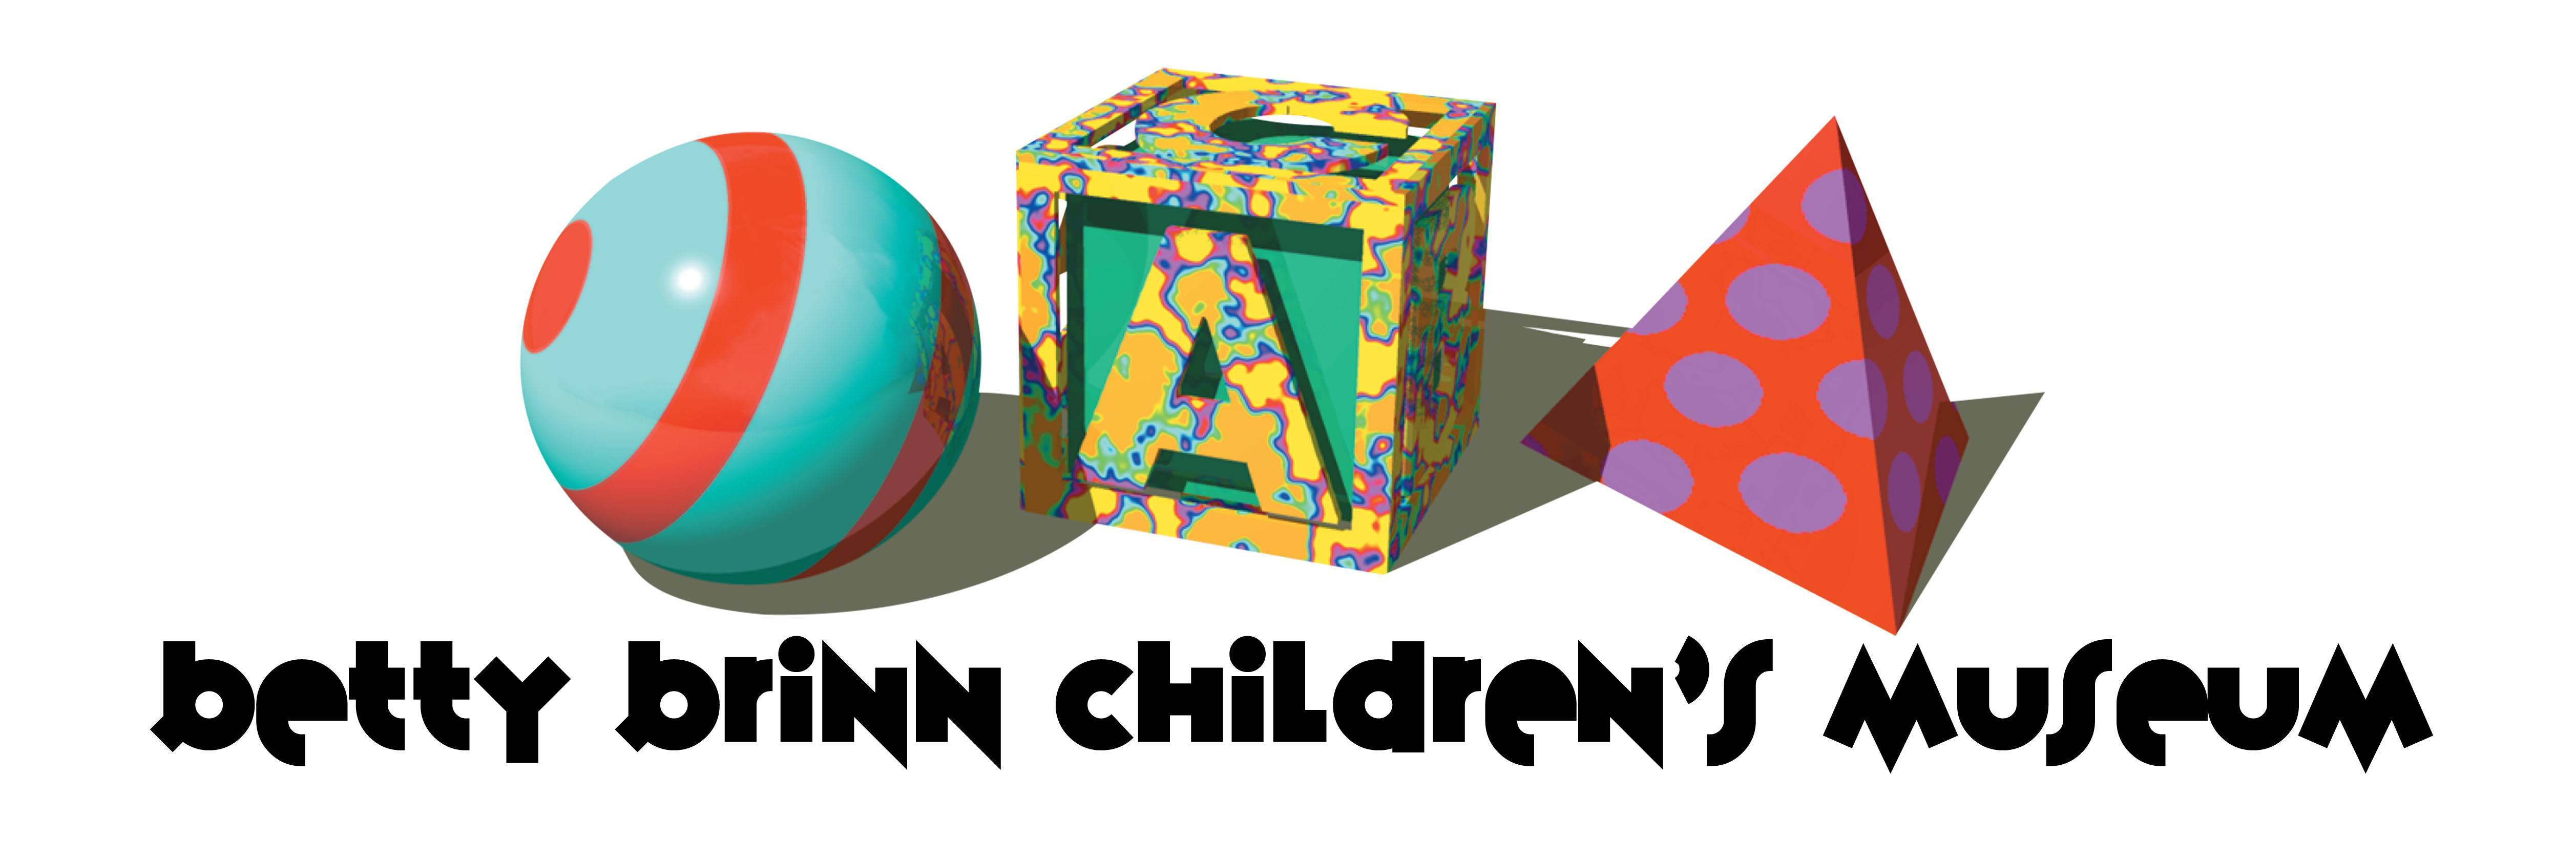 Betty-Brinn-Childrens-Museum-logo